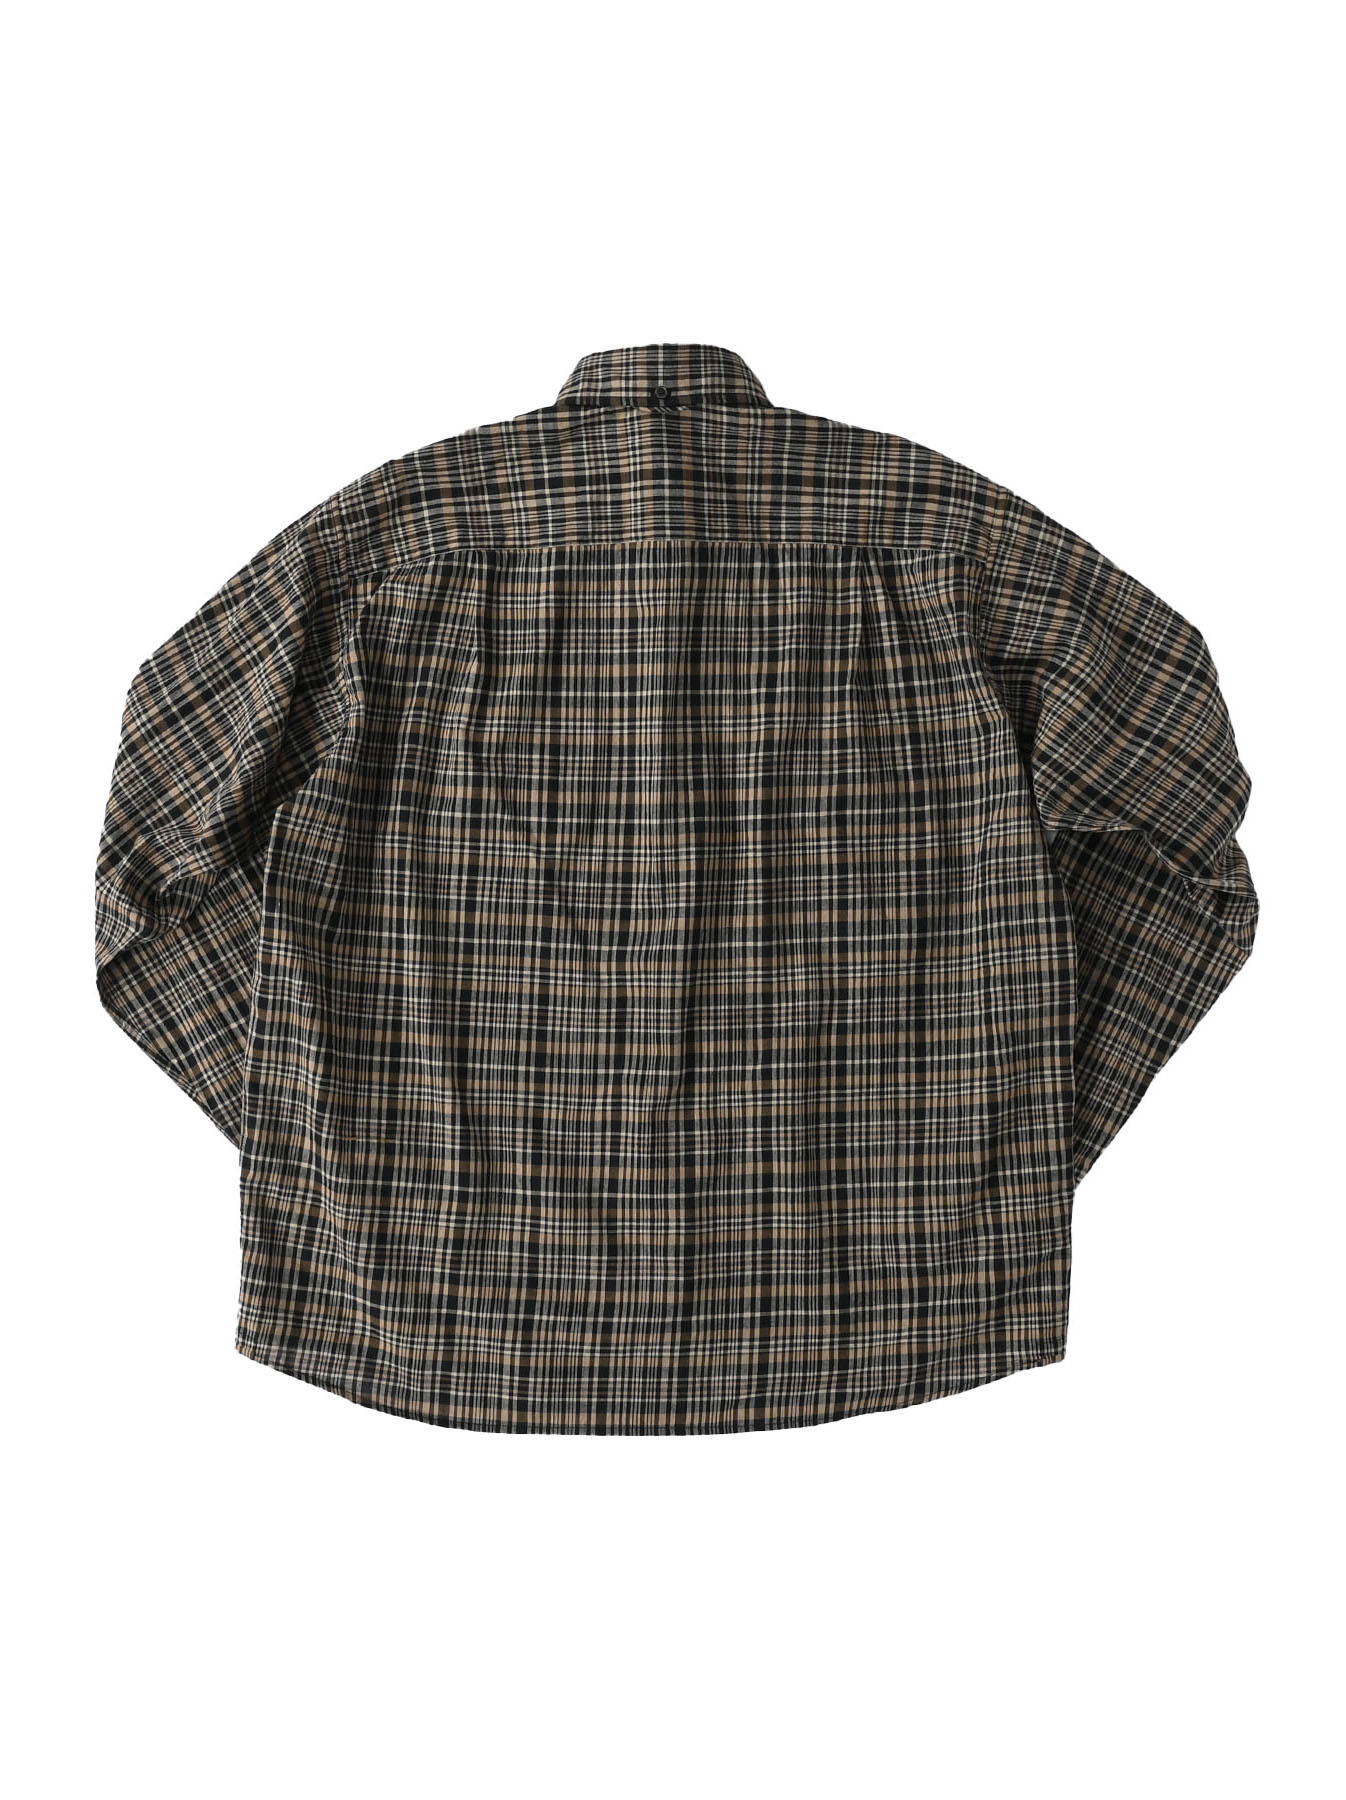 Indian Mugi-hira 908 Ocean Button Down Shirt (0421)-7